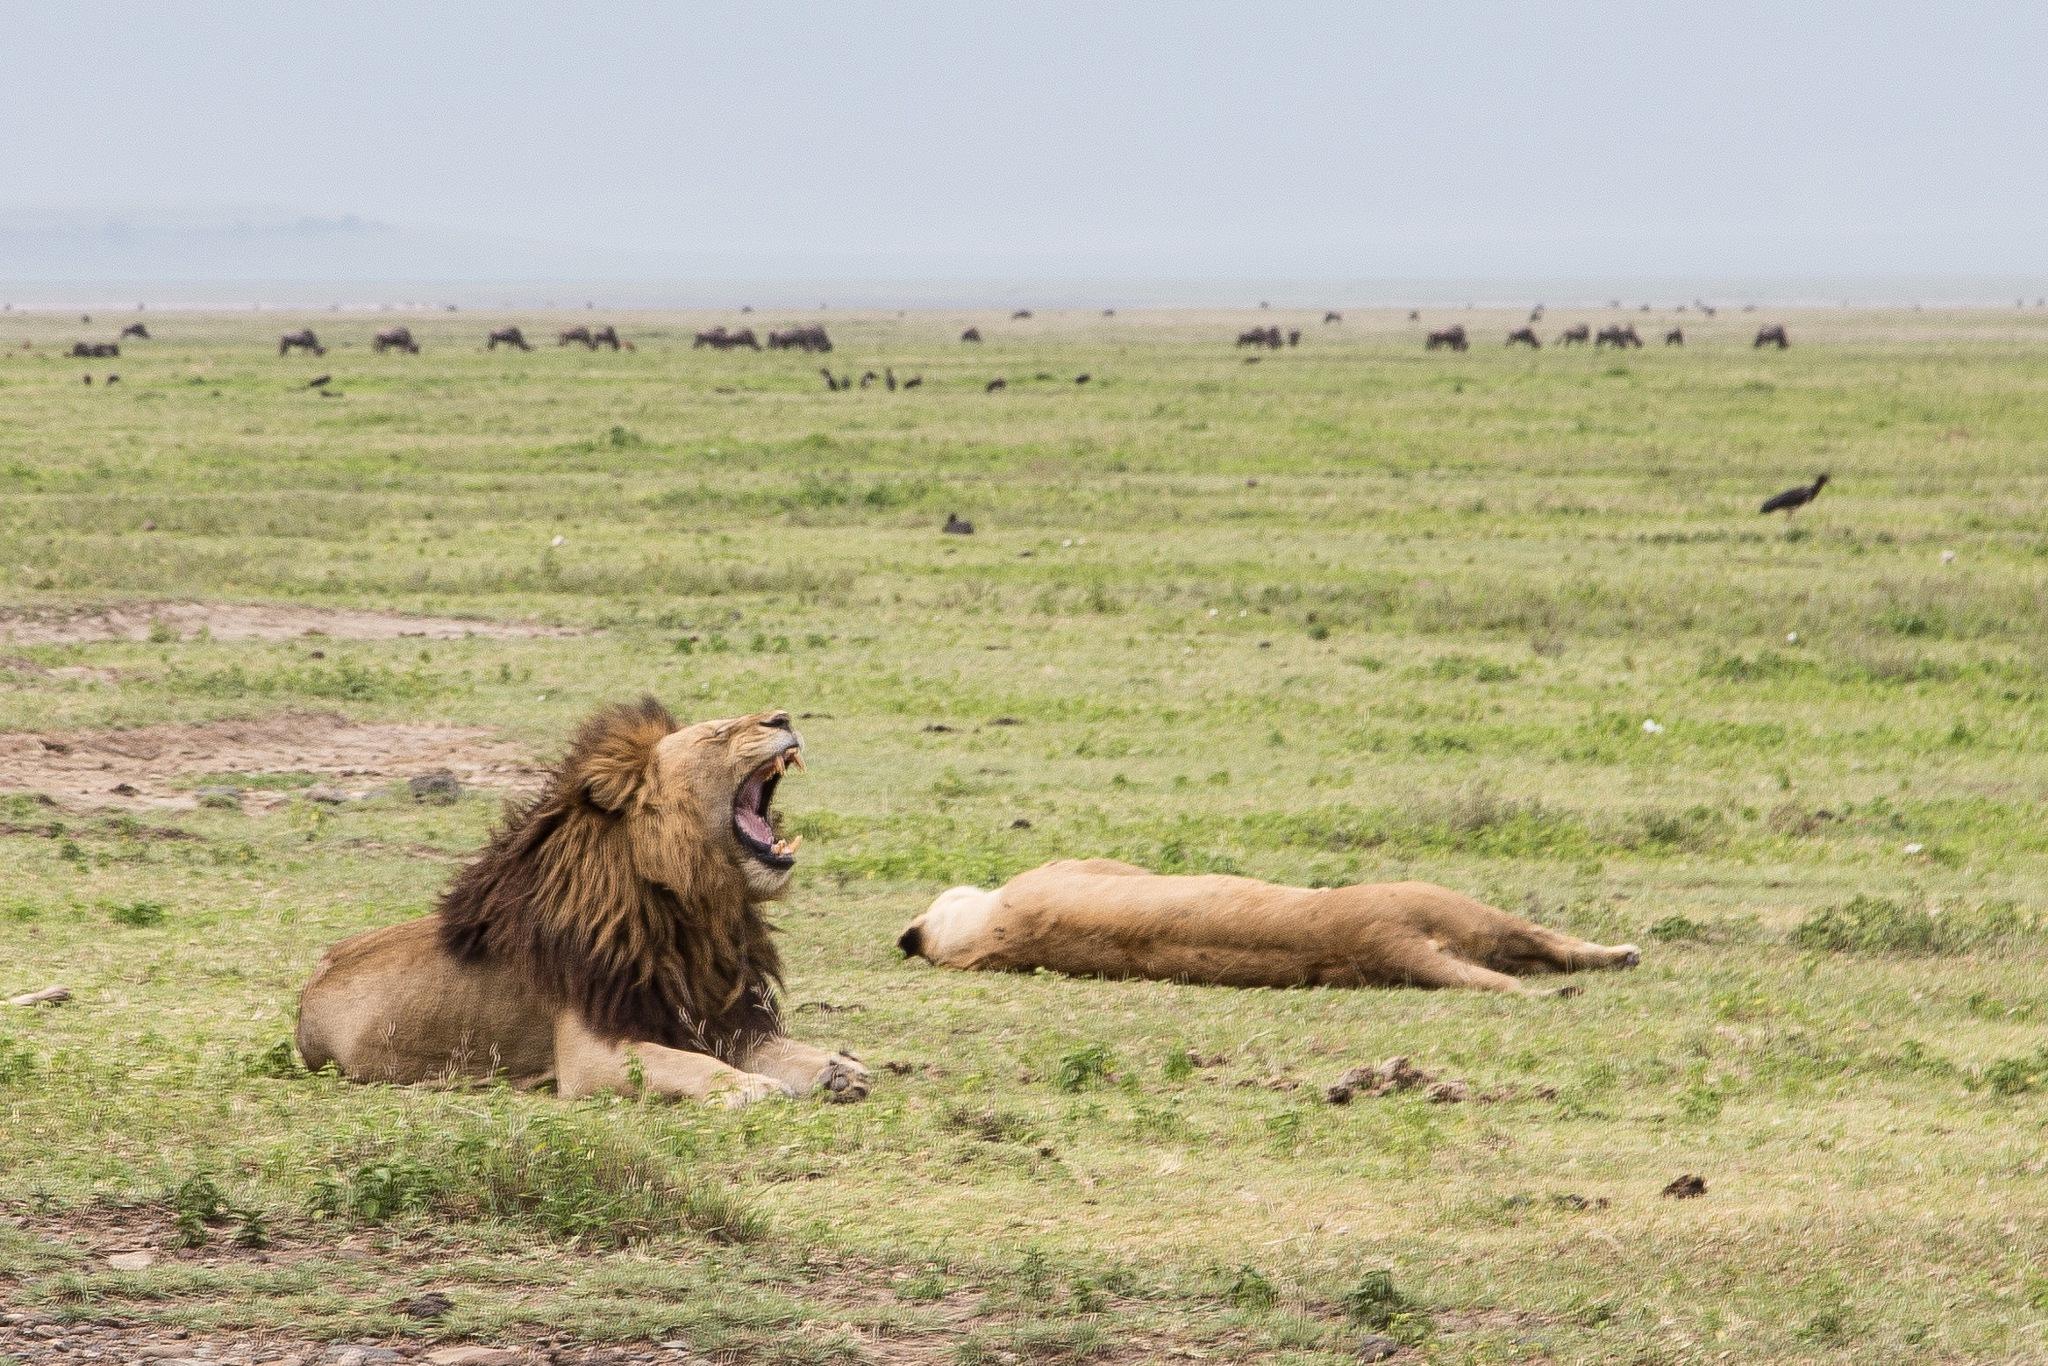 Ngorongoro Conservation Area, Ngorongoro, Arusha, Tanzania by Andrei Snitko